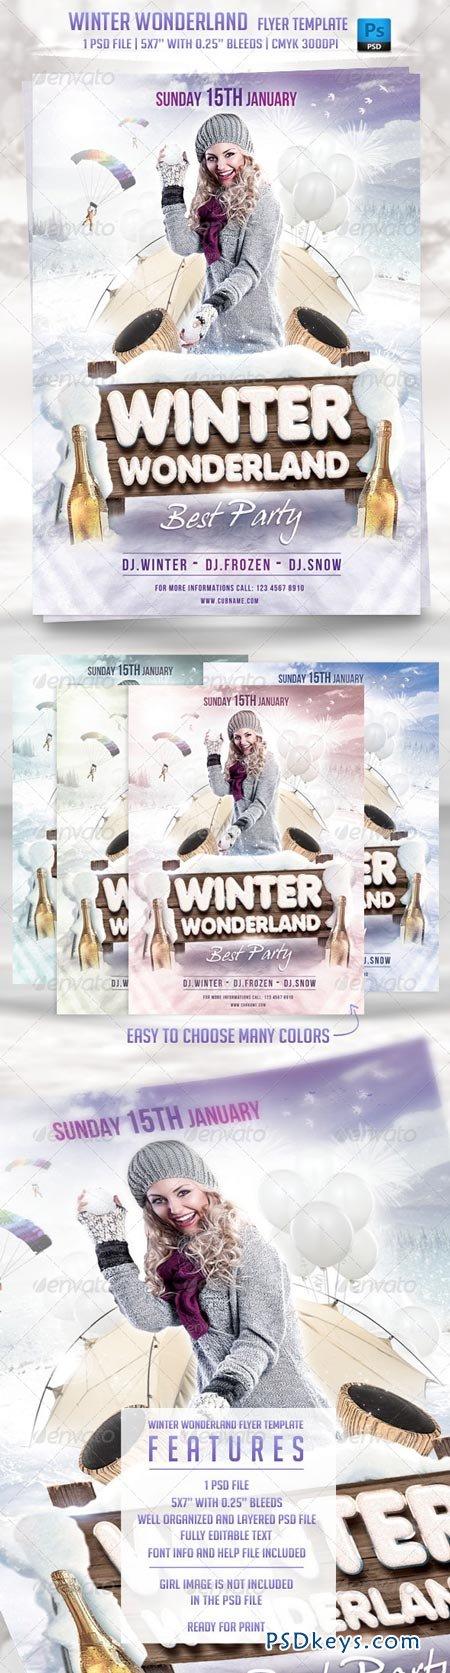 winter wonderland flyer template 6400891